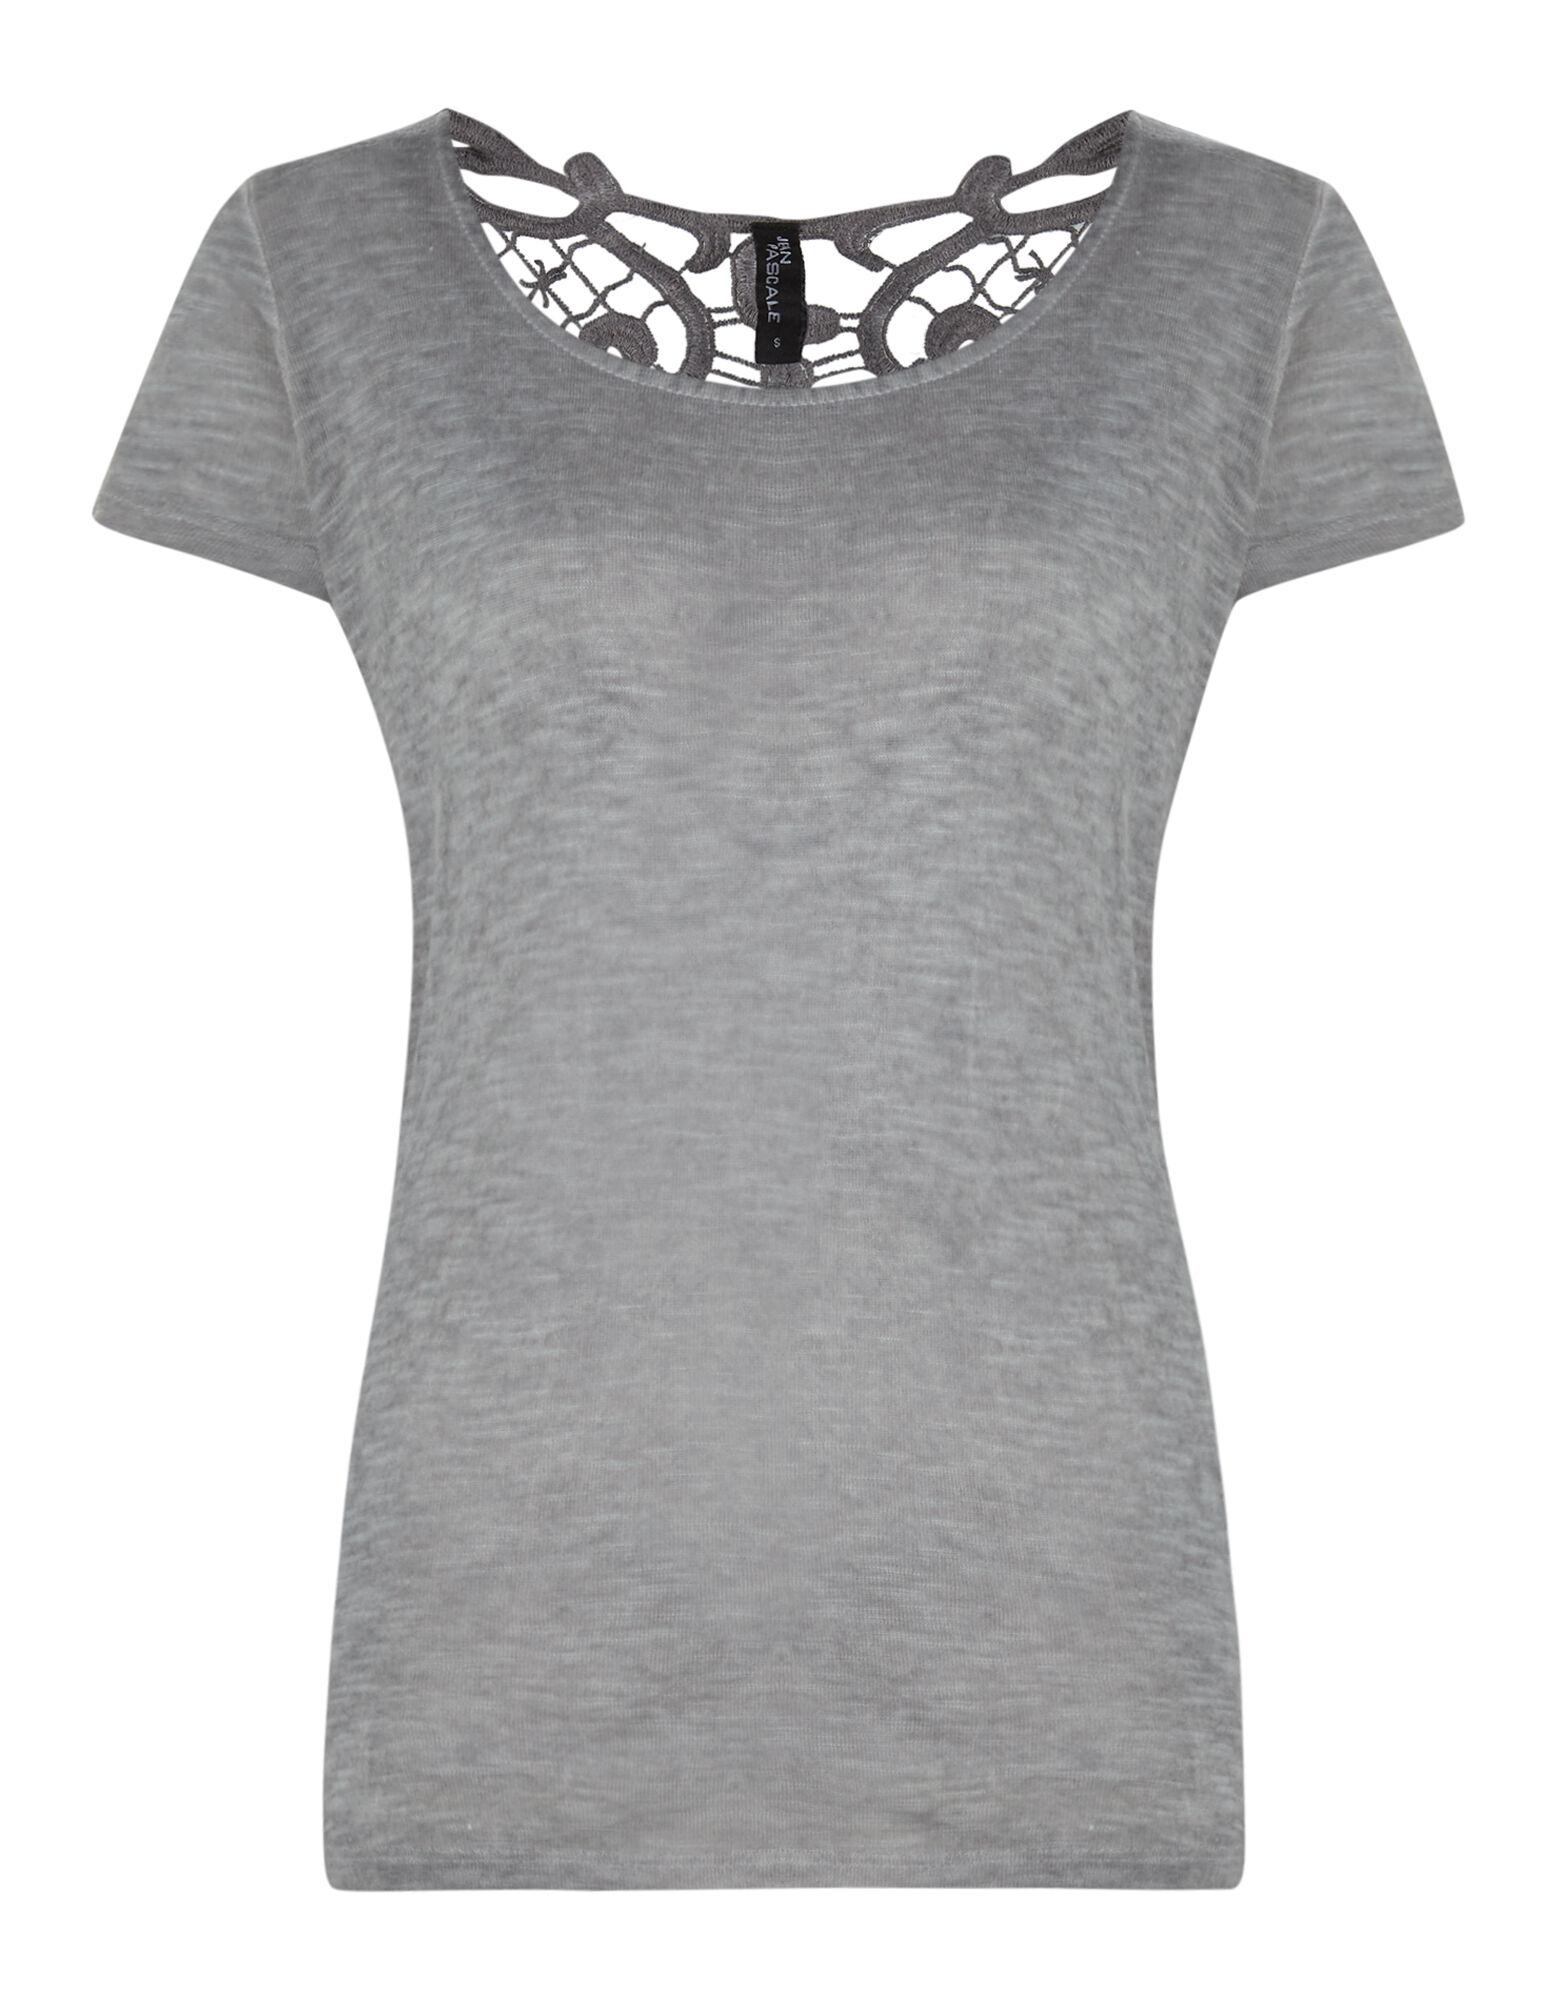 39e0c9e7a3b3fc Fashion Takko amp  Trendig Günstige T Shirts Damen Bequem Für AZP8Tq